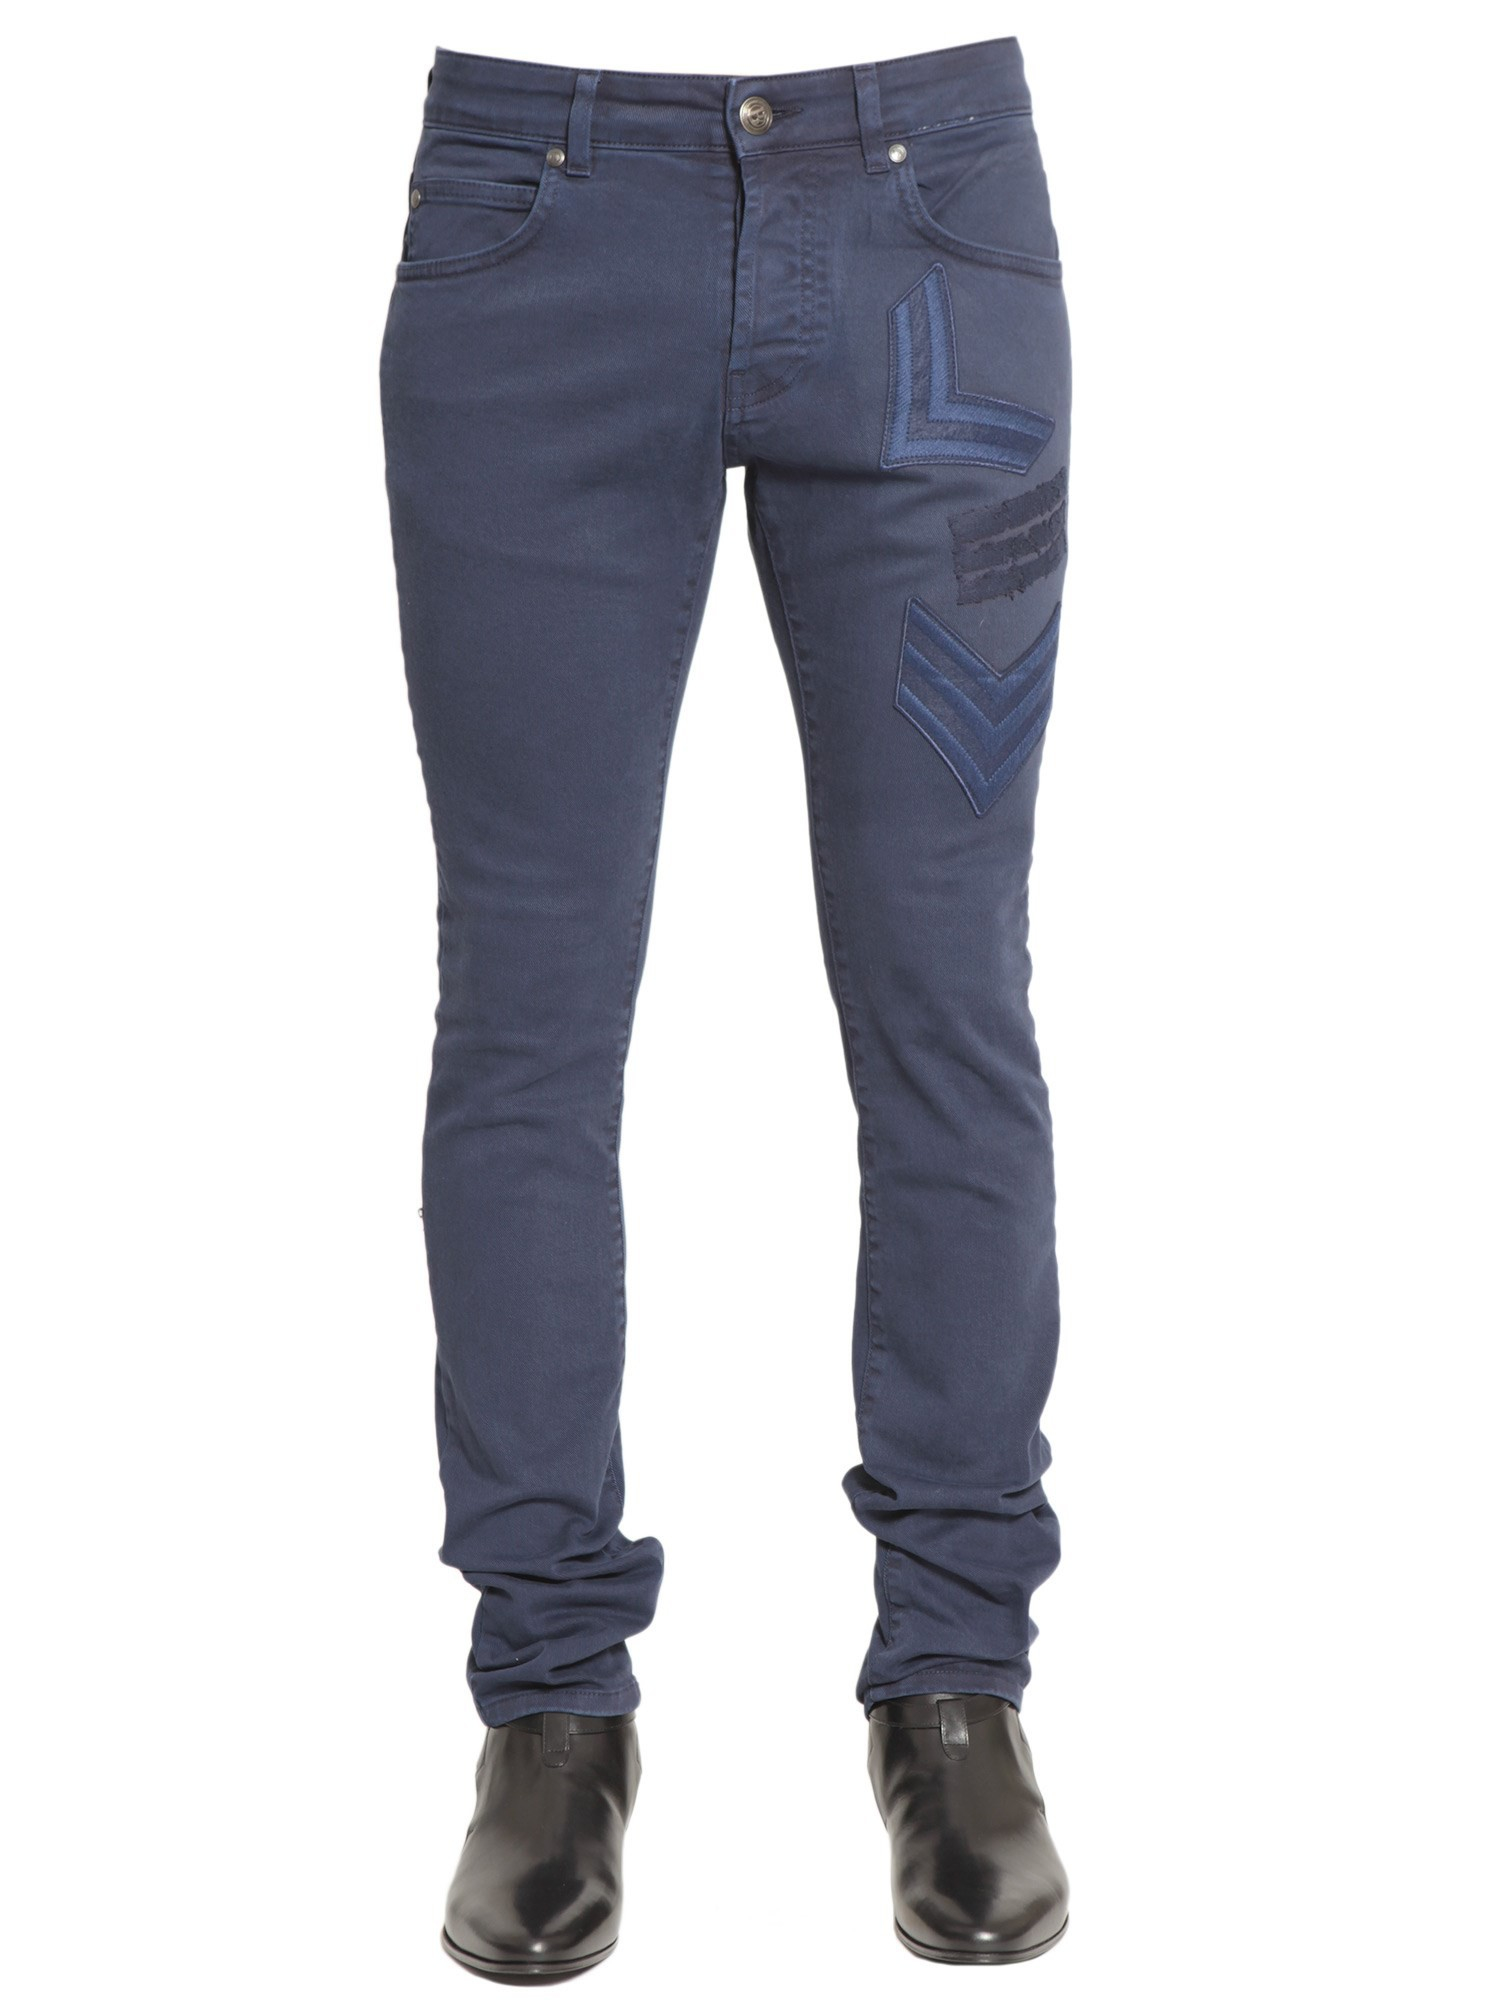 balmain cotton jeans with patch details in blue for men blu lyst. Black Bedroom Furniture Sets. Home Design Ideas